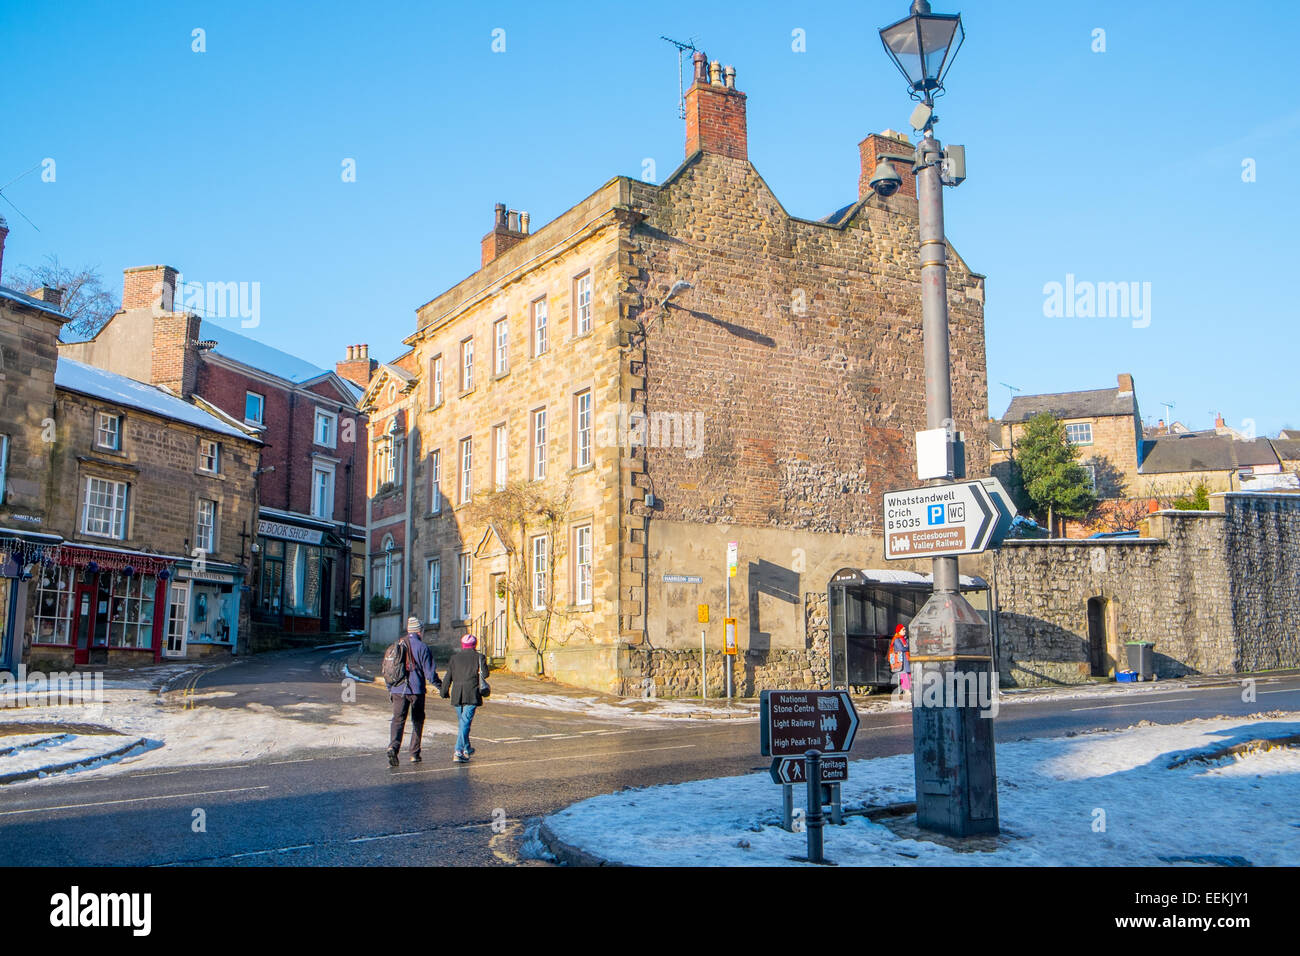 village of Wirksworth in Derbyshire Dales,England Stock Photo